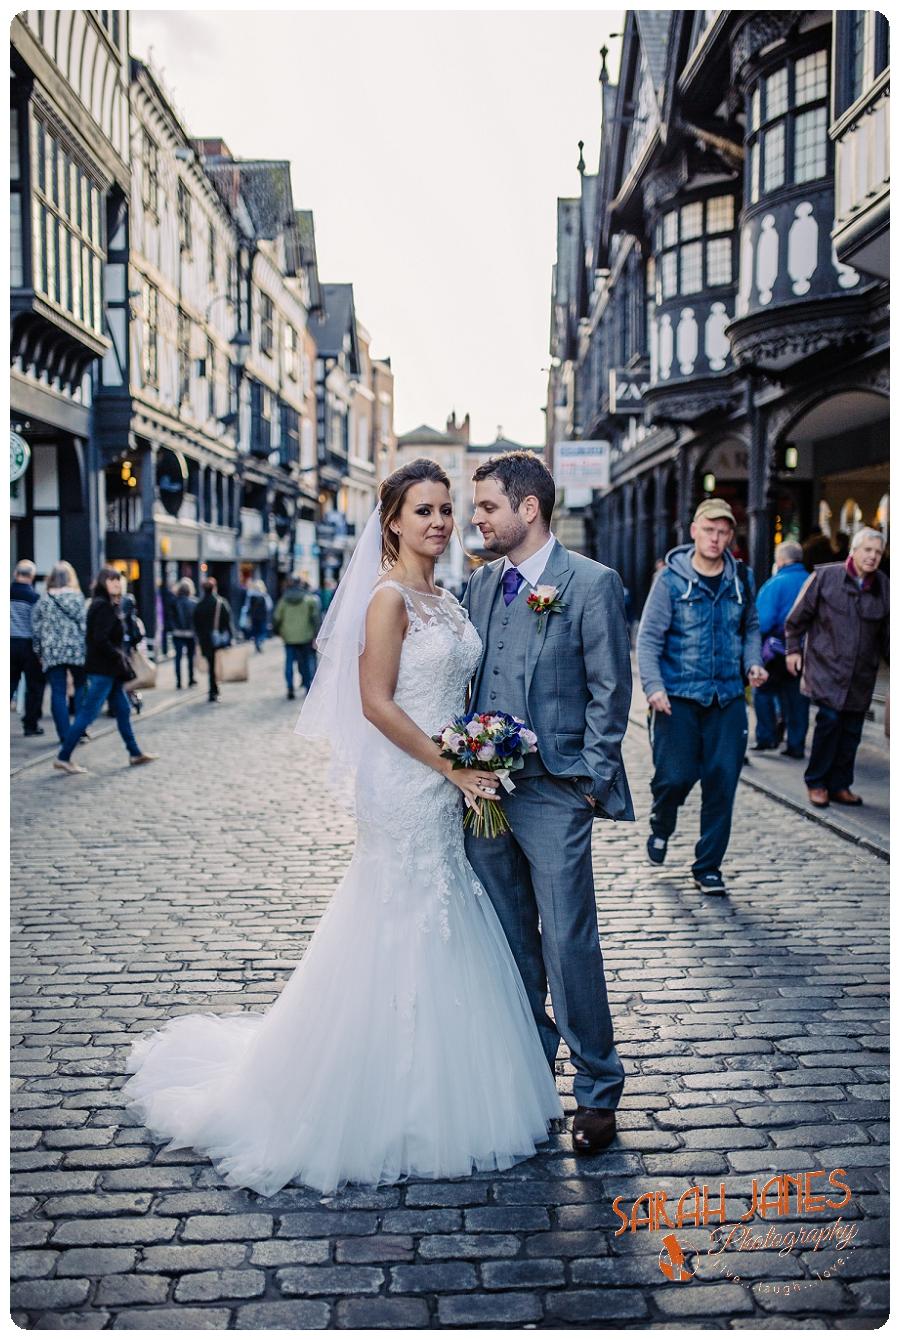 Wedding photography Chester, Weddings Rowton Hall, Wedding photography at Rowton Hall, Sarah Janes Photograpphy_0030.jpg